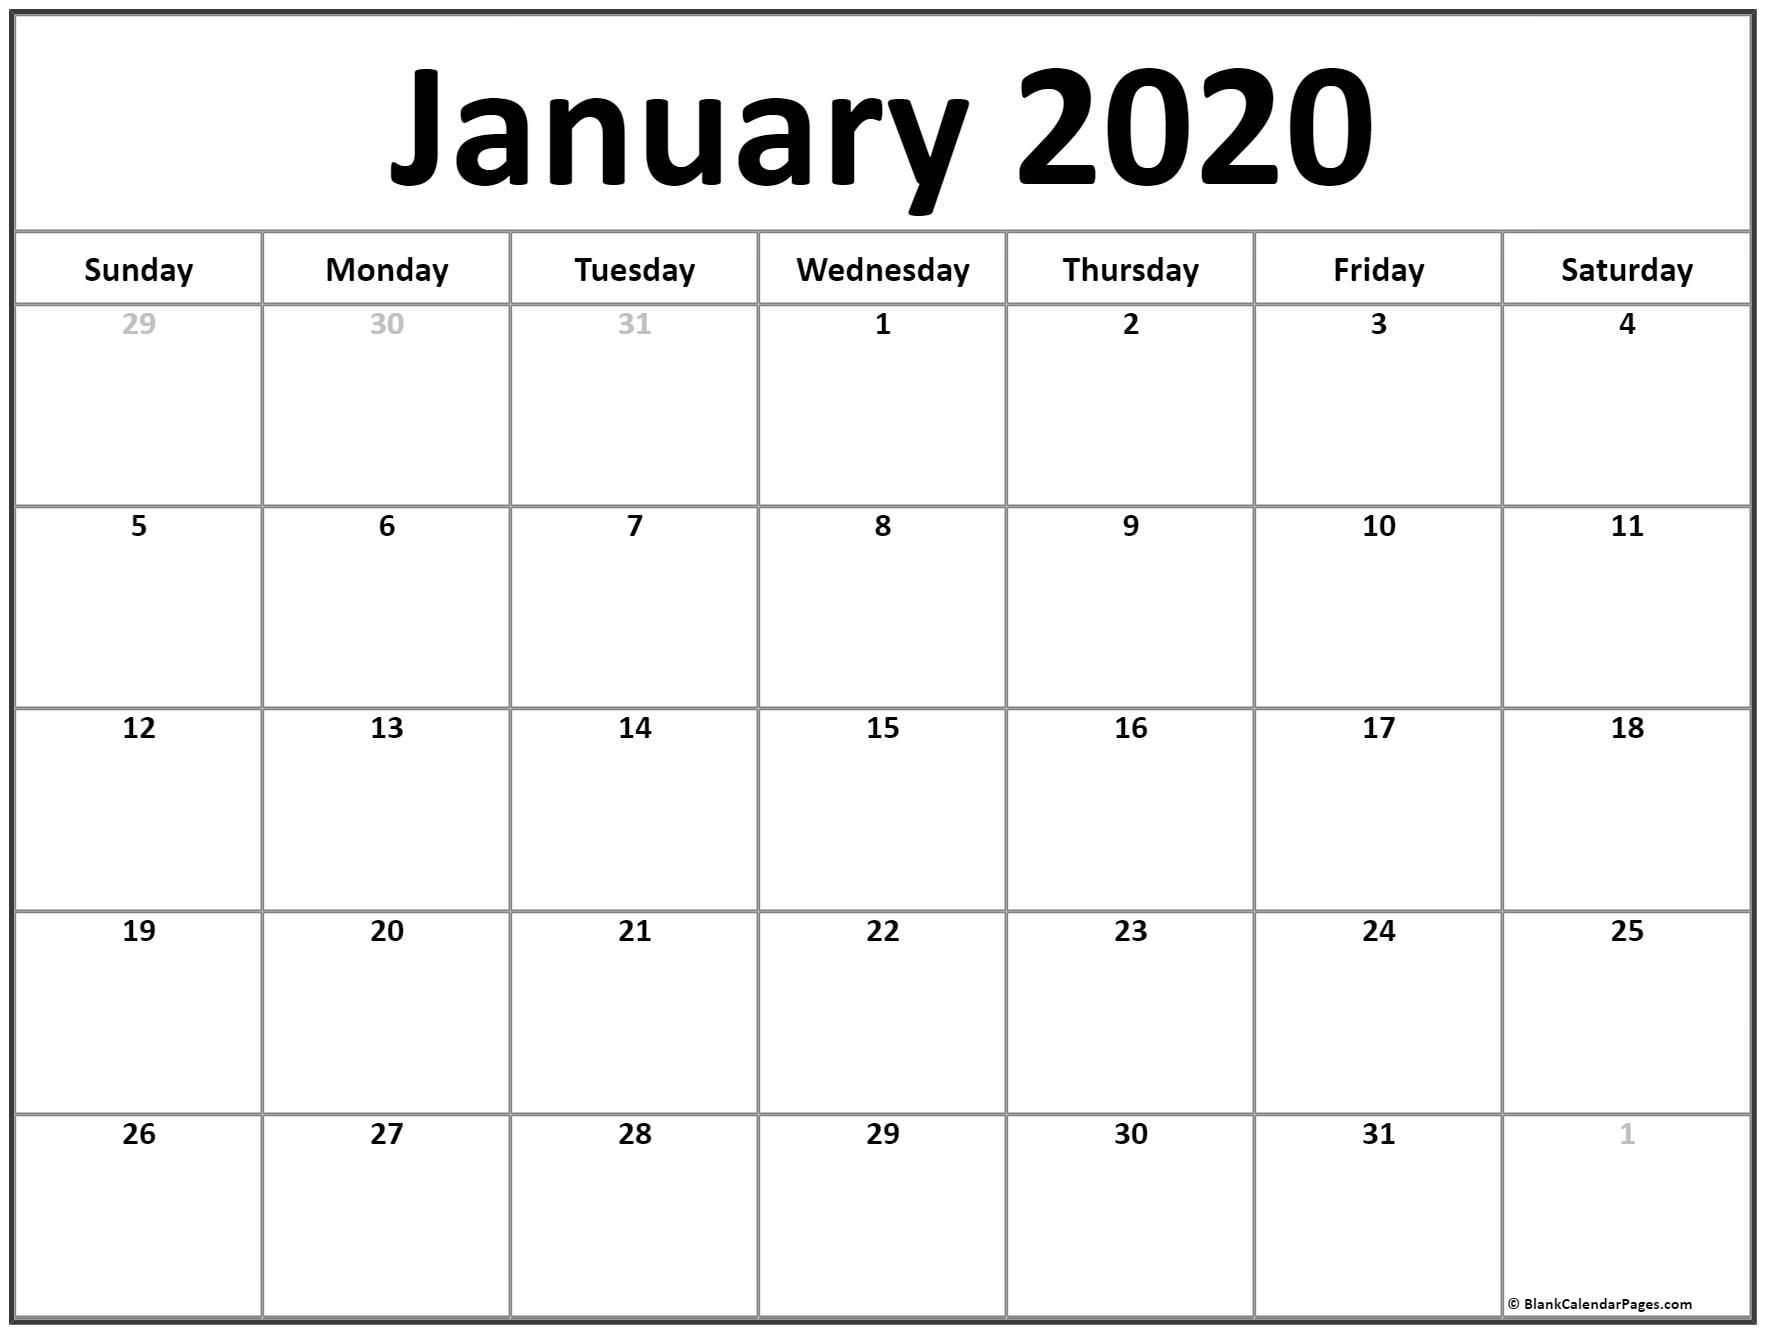 January 2020 Calendar Printable January 2020 Calendar